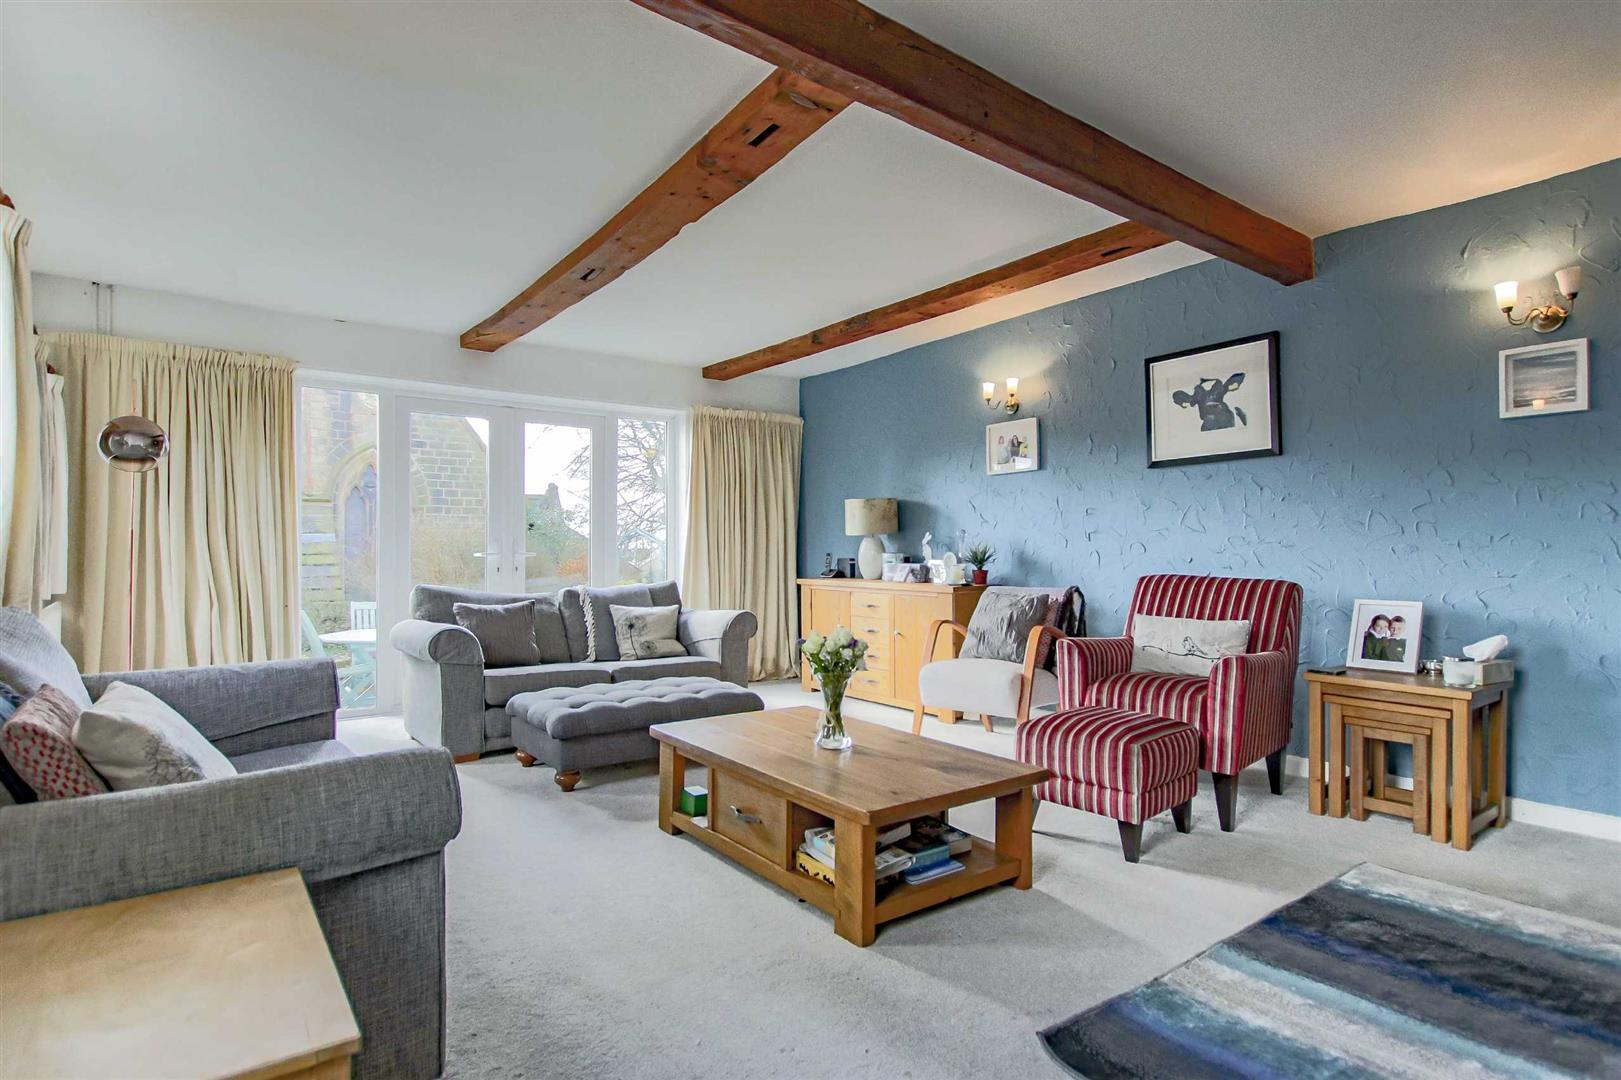 4 Bedroom Detached House For Sale - p033686_32.jpg